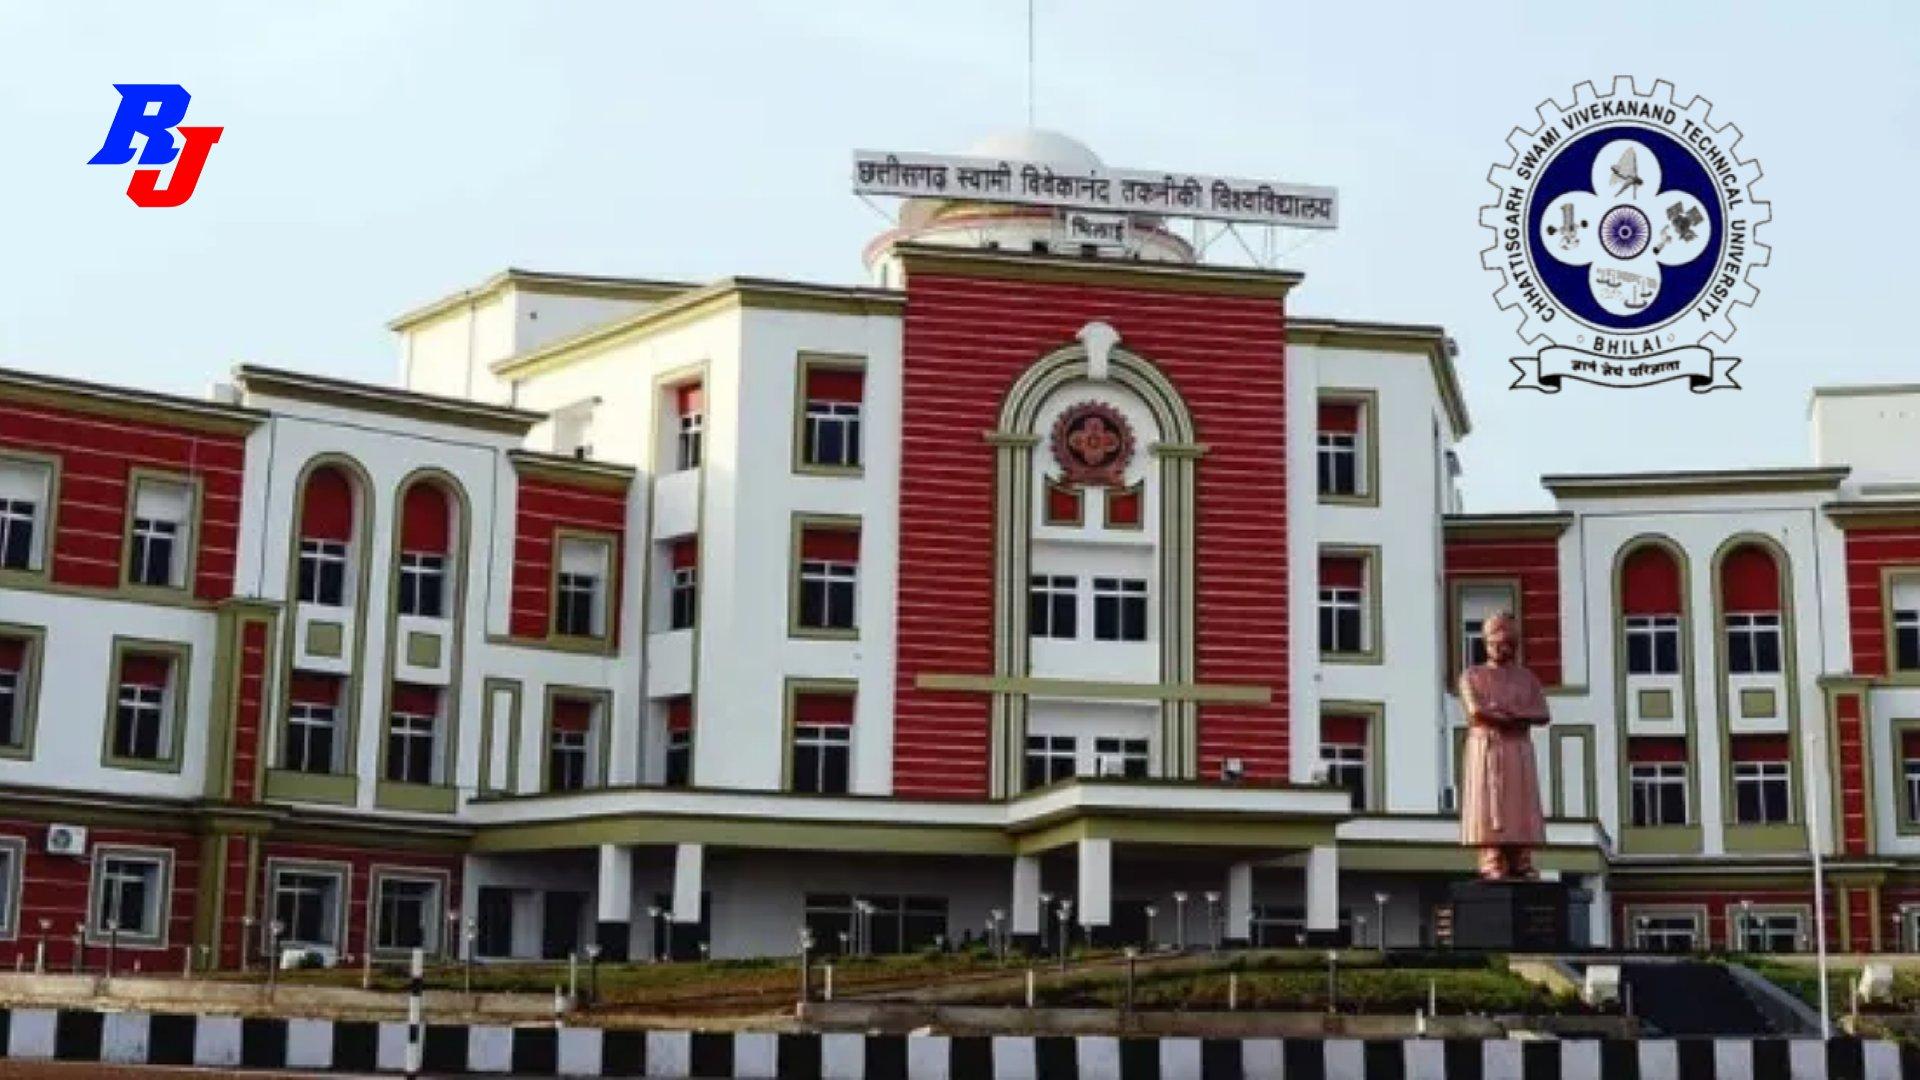 Temporary Faculty Posts (Online Interview) in CSVTU, Bhilai, Chhattisgarh, India